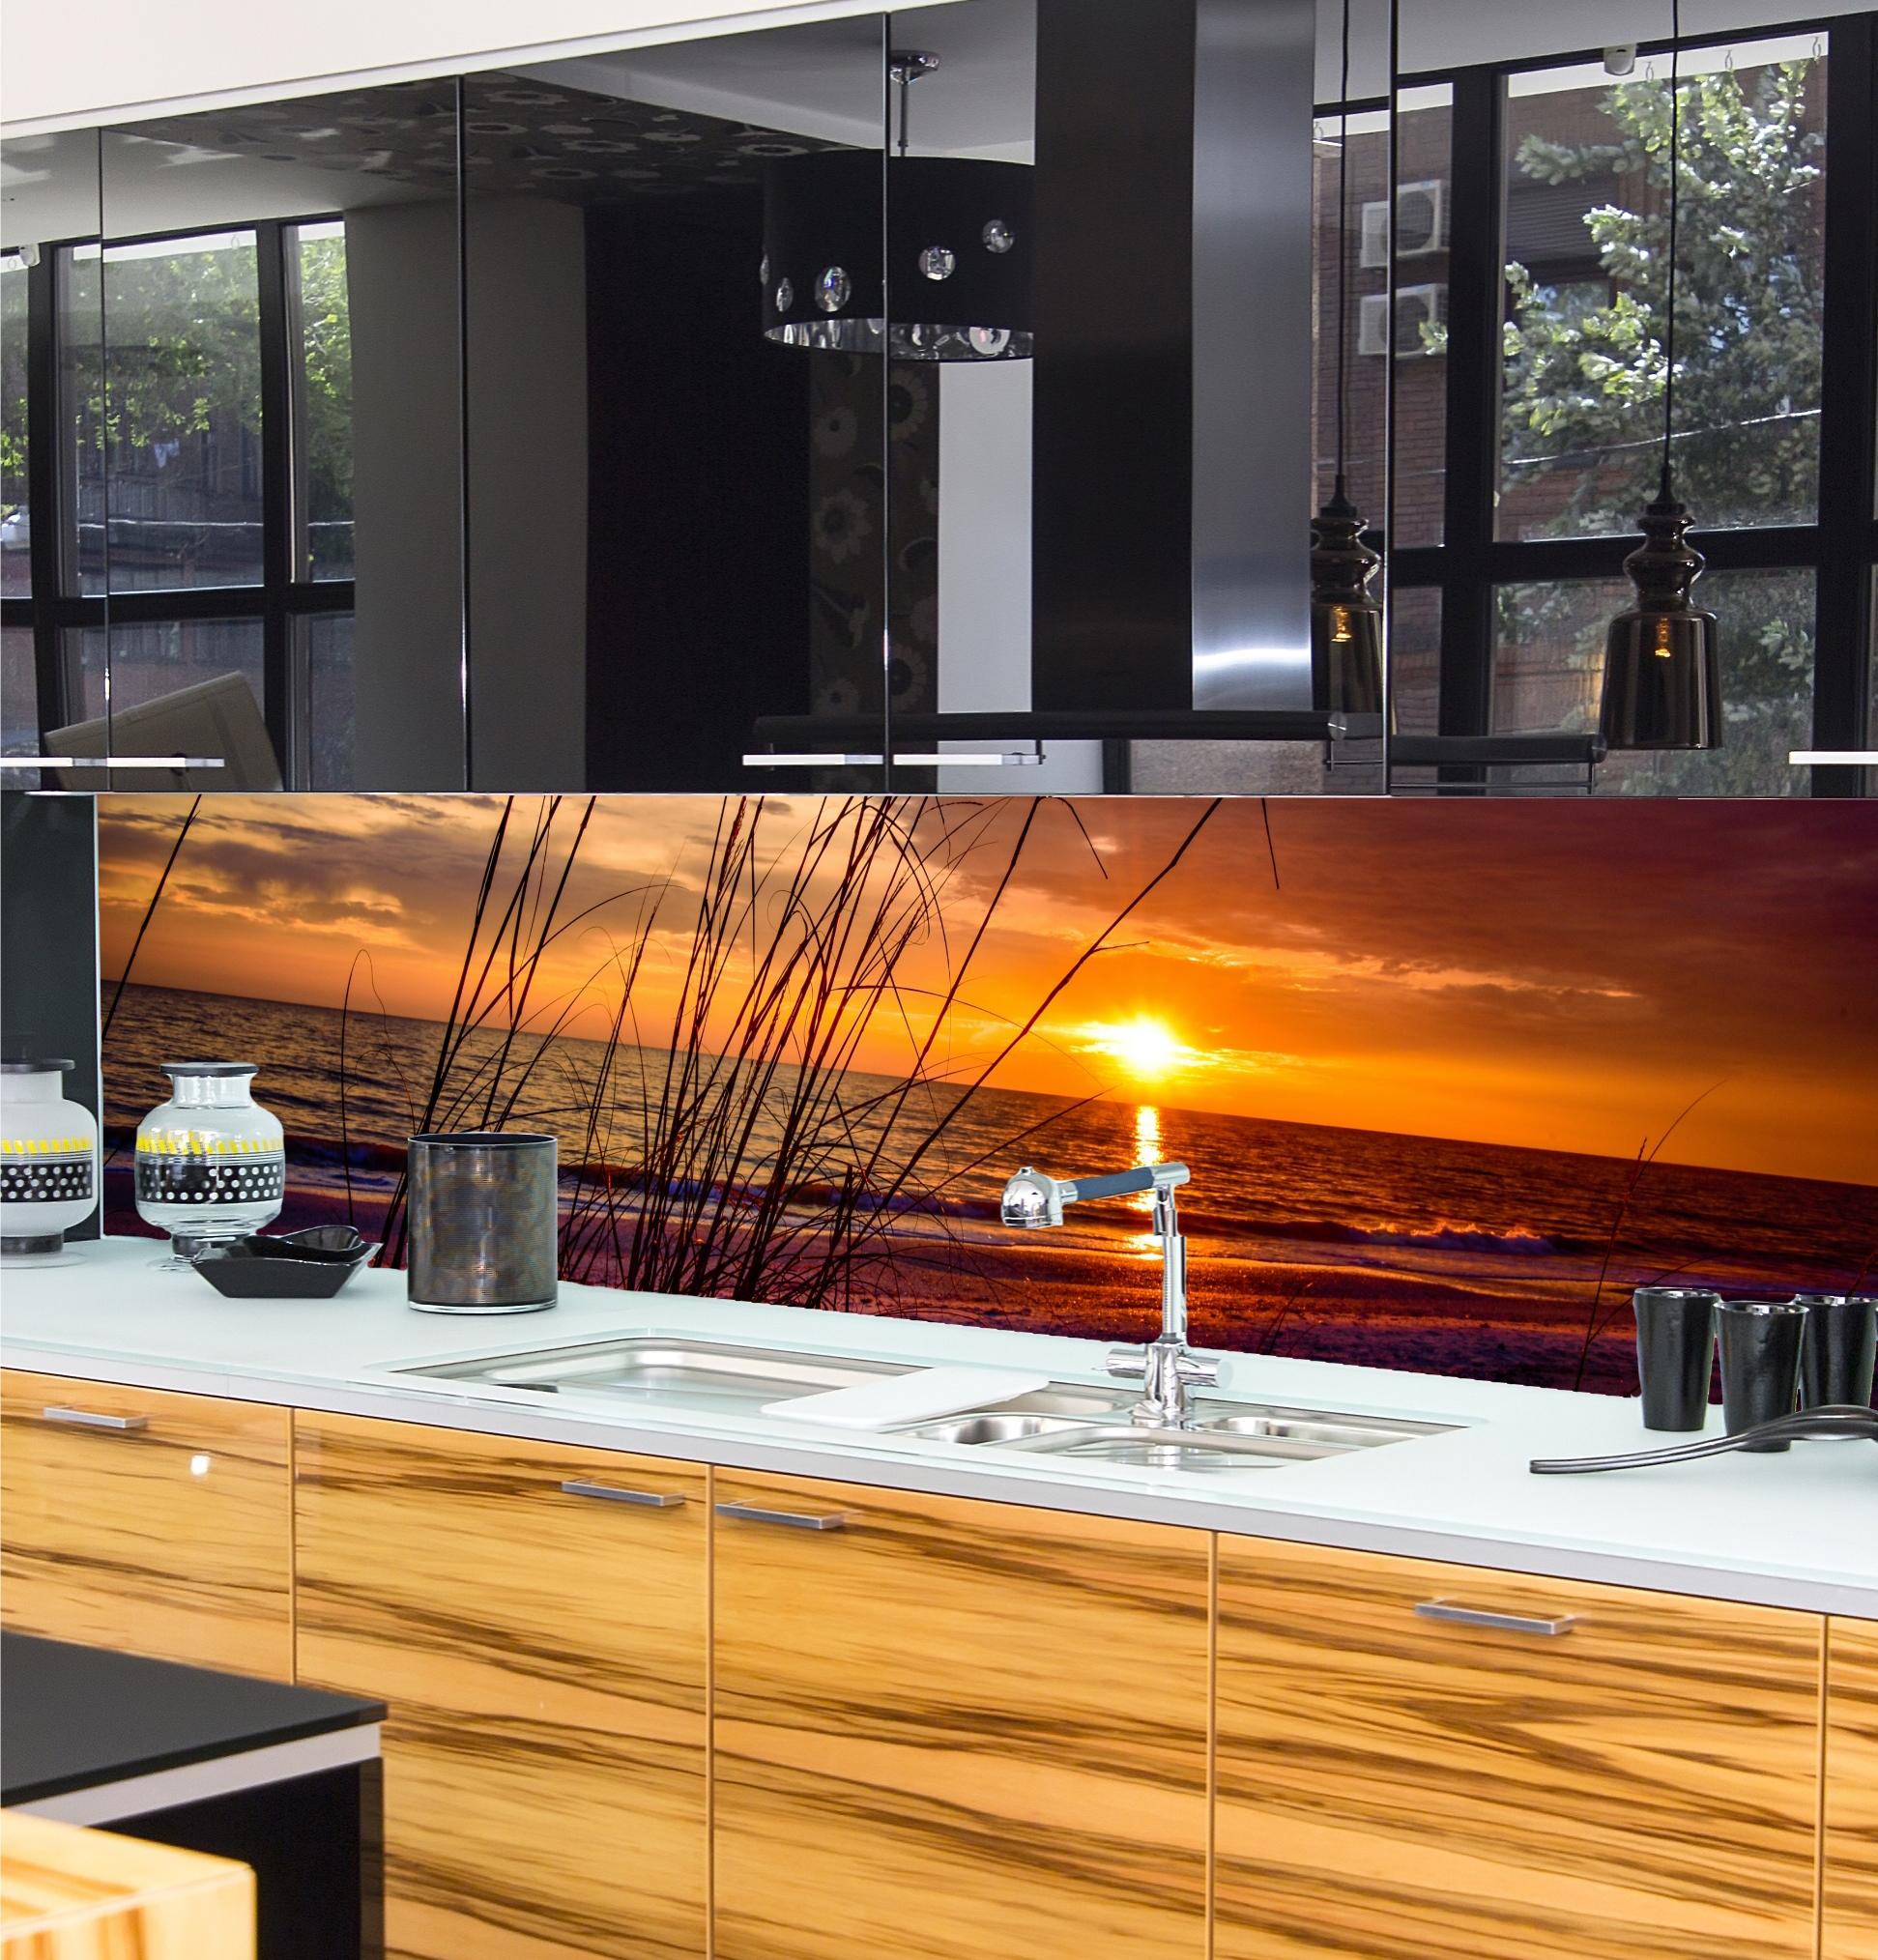 Kuchenruckwand nach mass kuchenruckwand spritzschutz for Küchenrückwand motiv